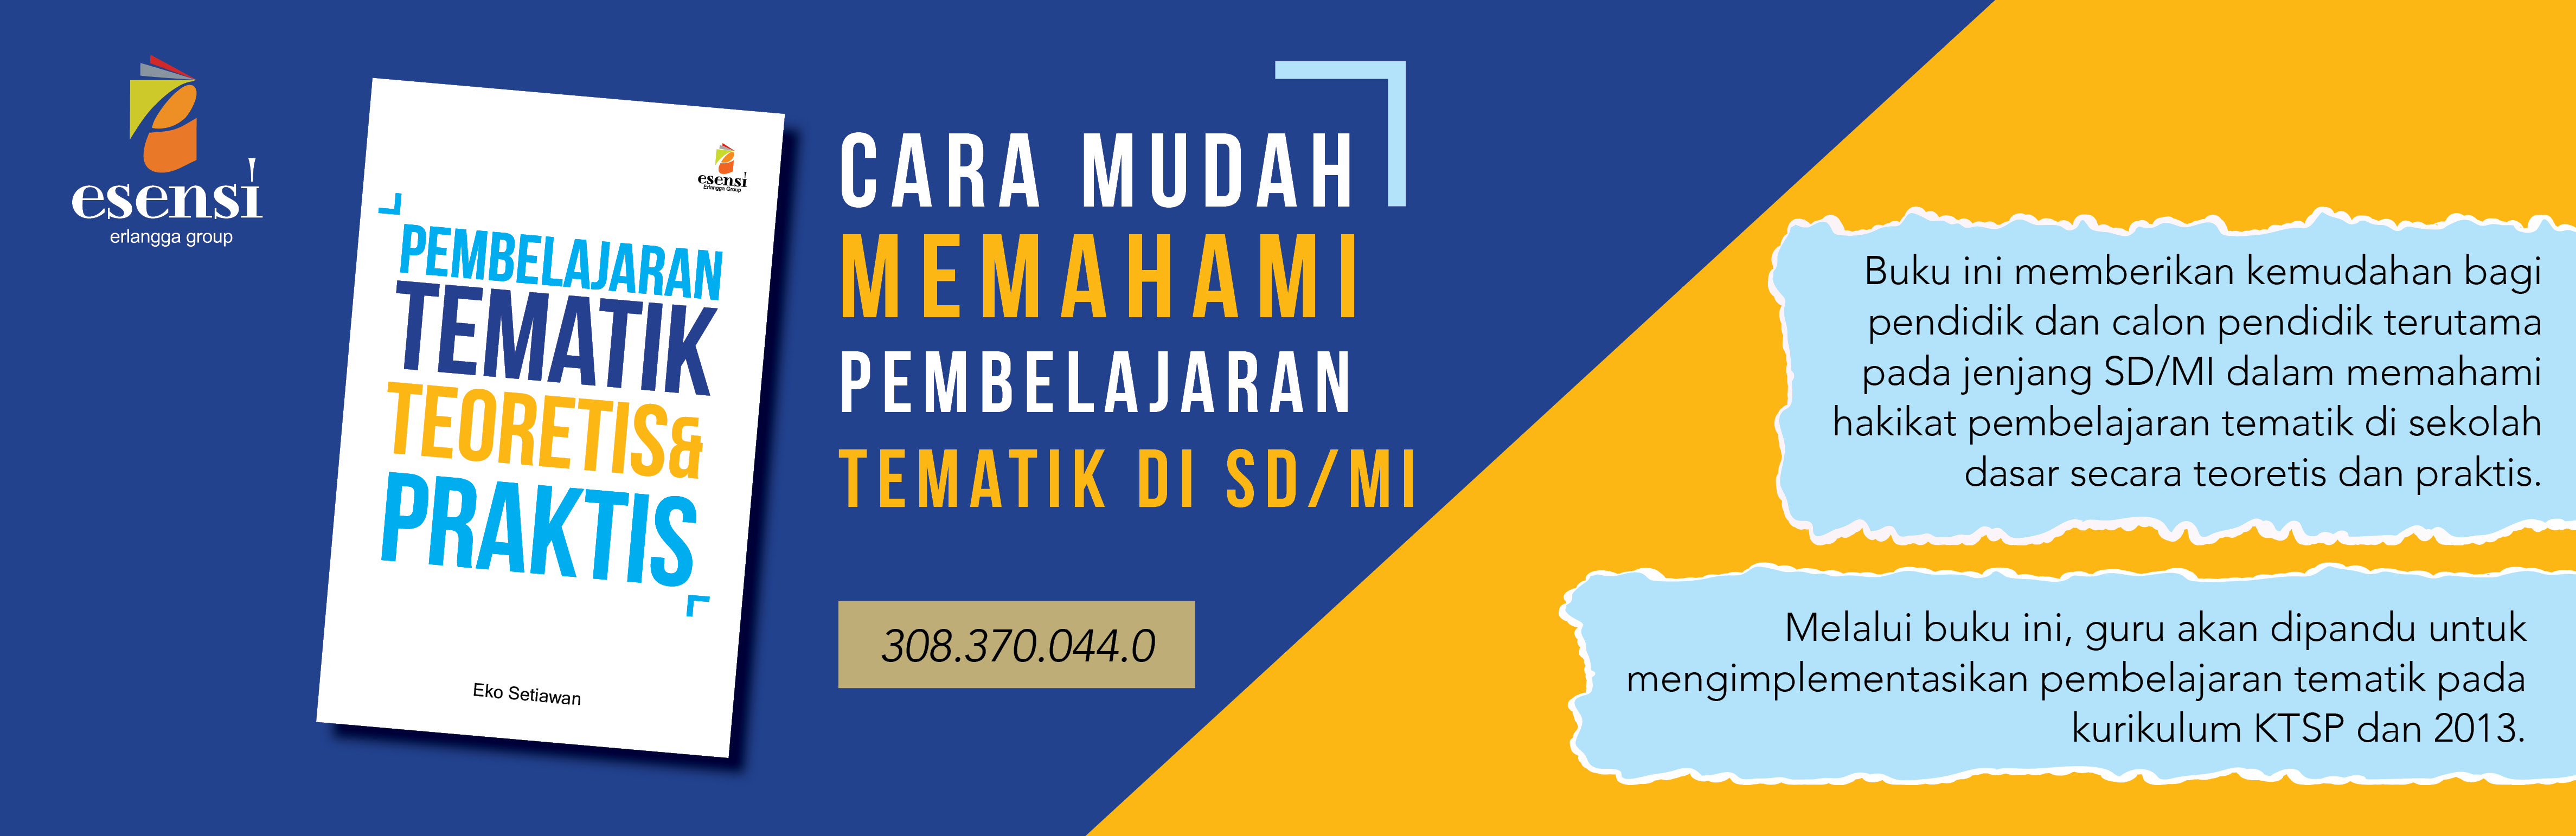 Kompetensi Pedagogik   Profesional Guru PAUD   SD MI - Untuk Wanita Muda  dan Modern ce2d24696b0b0